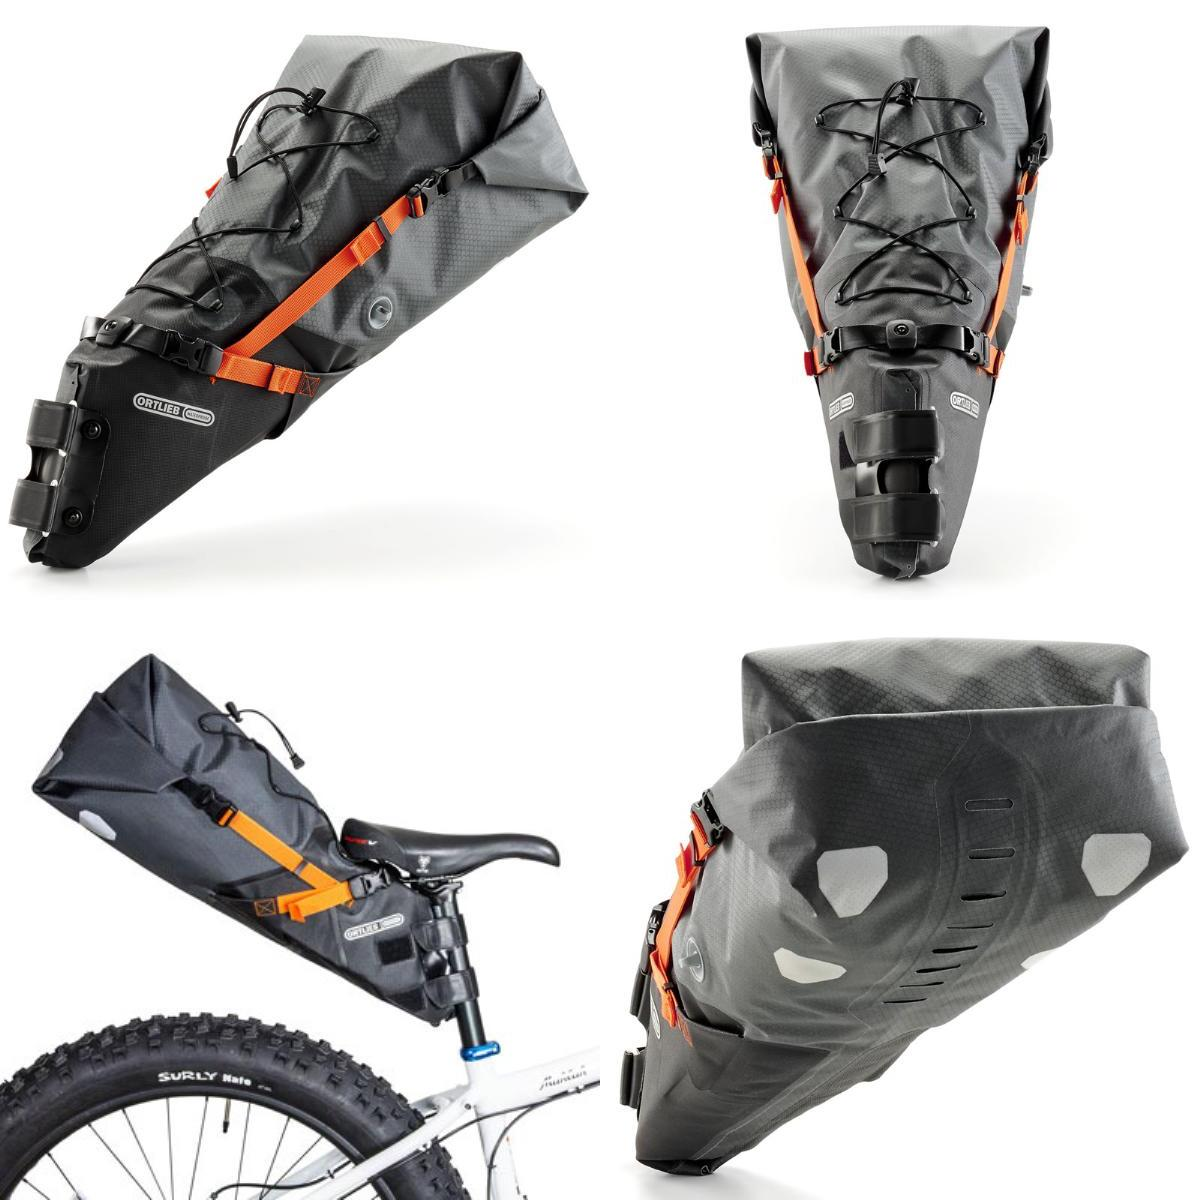 【】ORTLIEB(オルトリーブ) バイクパッキング シートパック L 8-16.5L スレート F9901【SMTB】